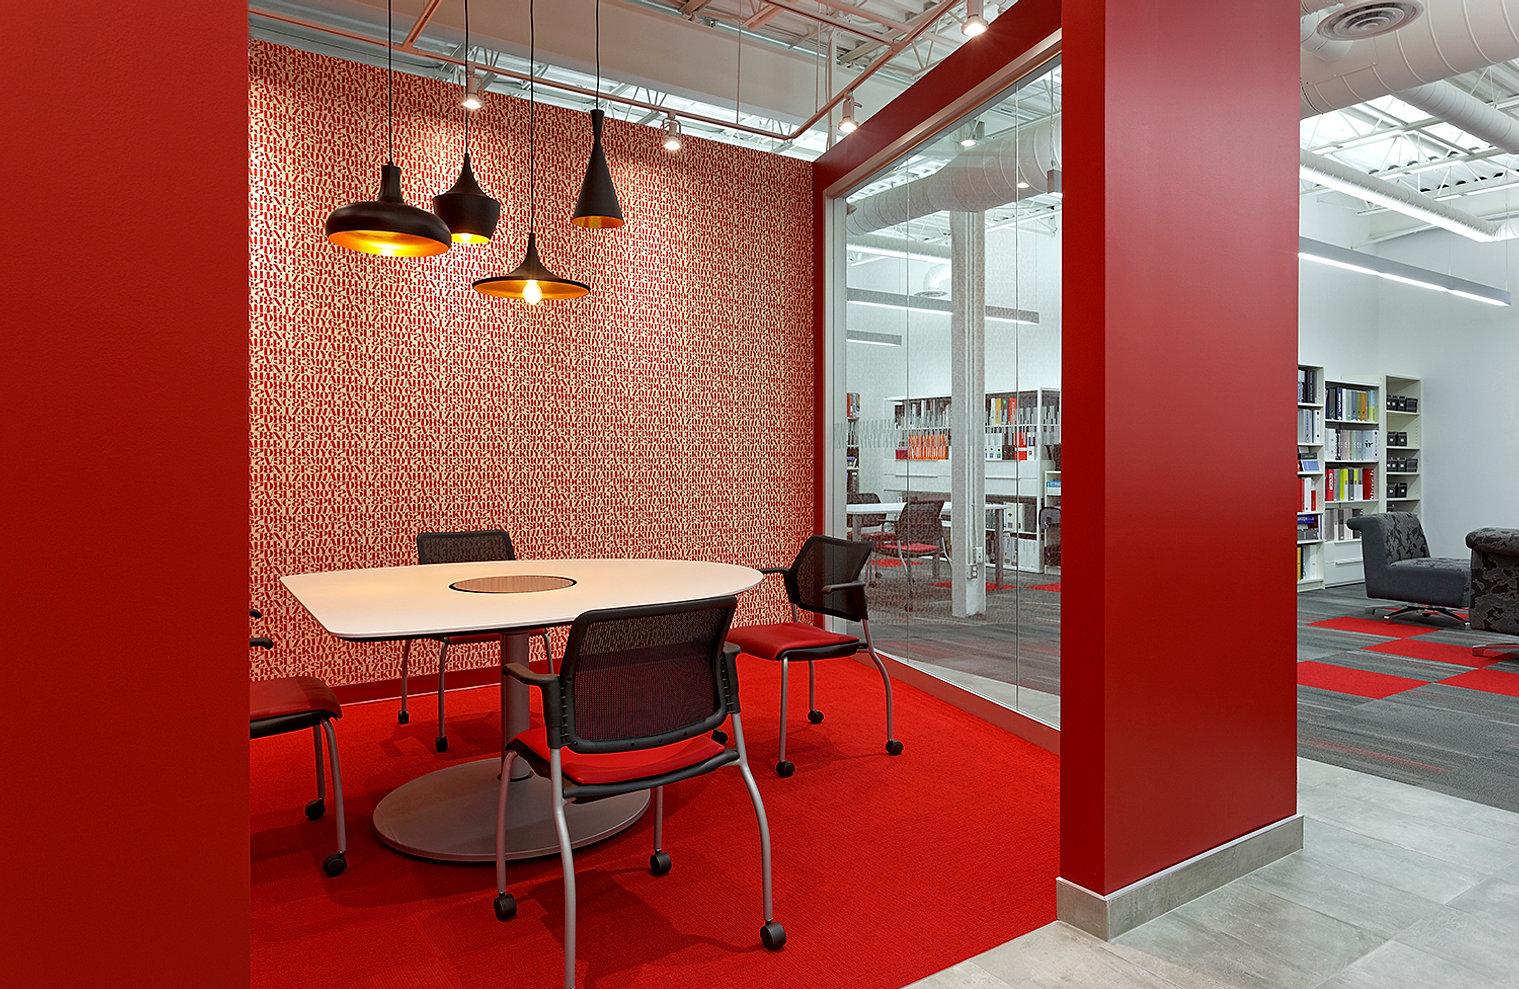 About LDB Design Inc